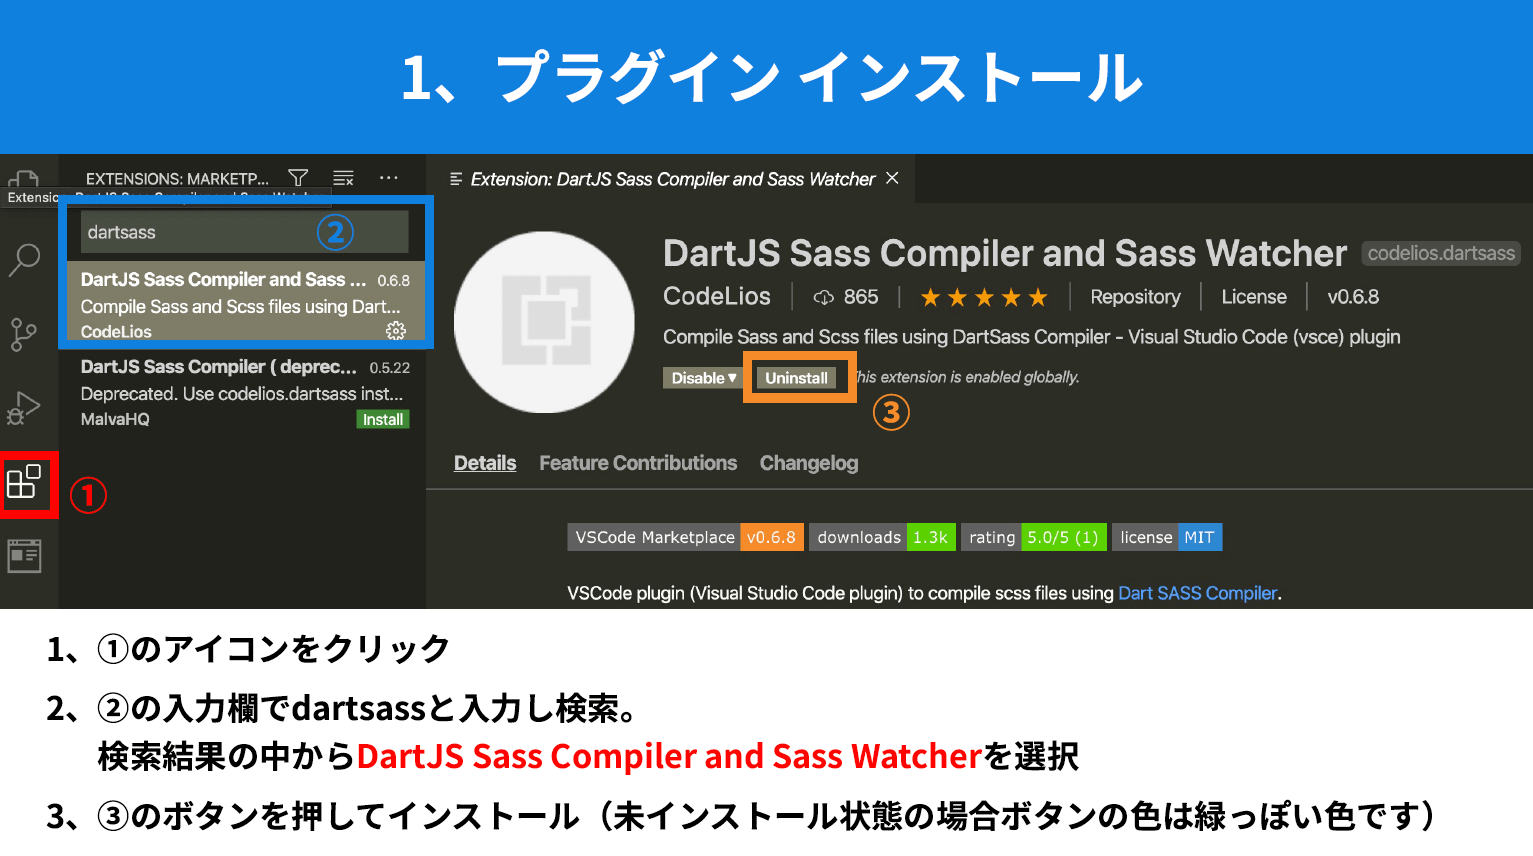 DartJS Sass Compiler and Sass Watcherプラグインのインストール